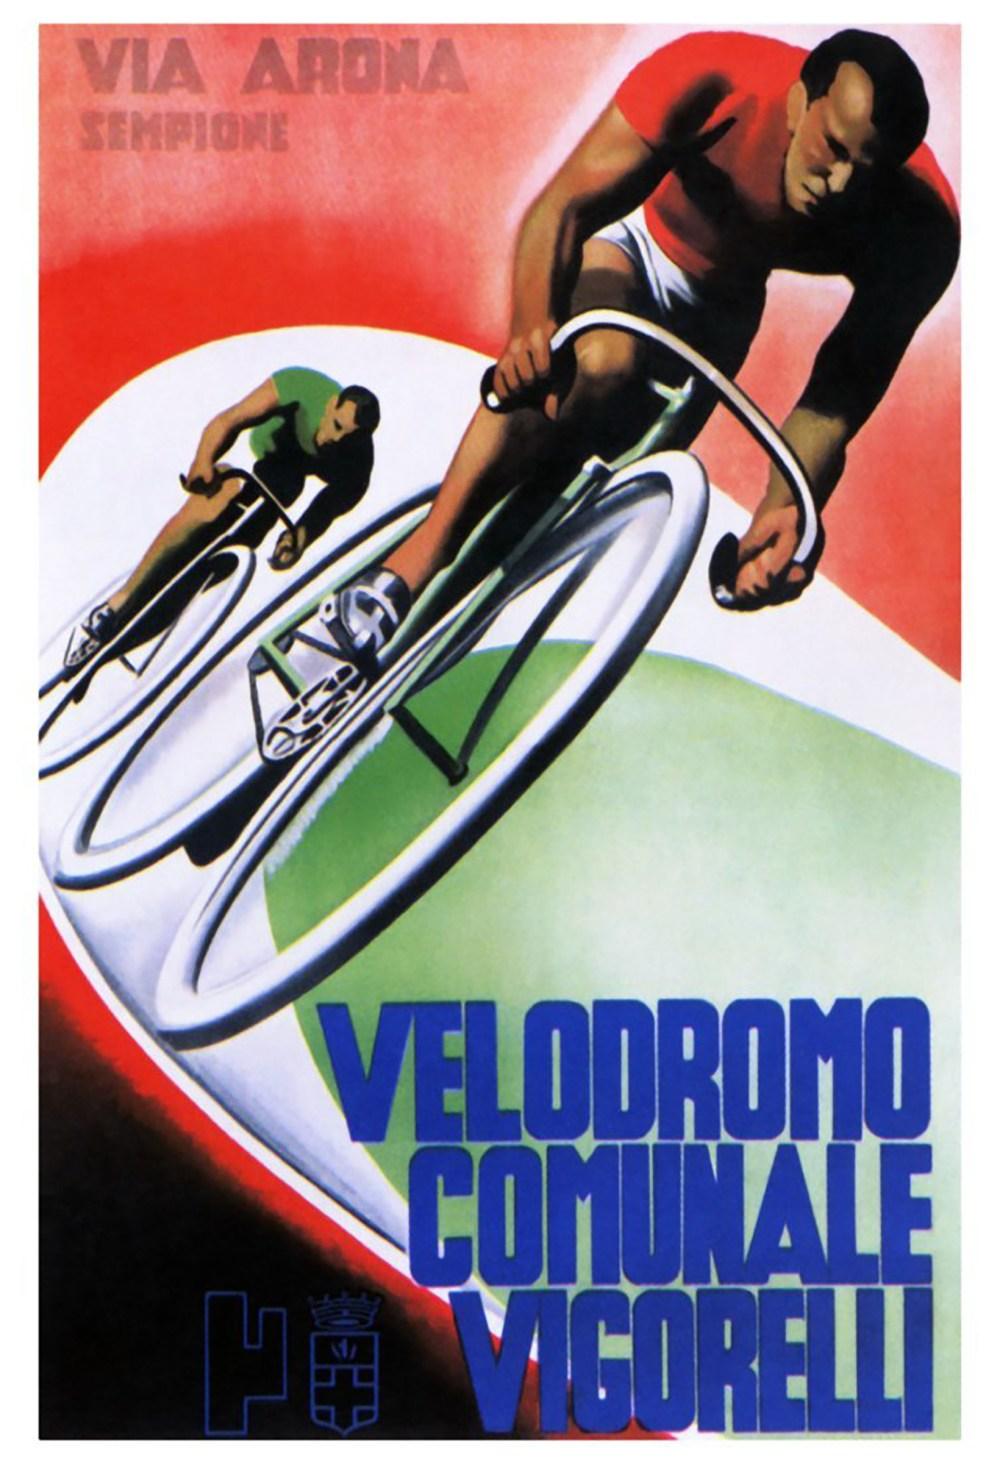 ebykr-velodromo-cumunale-vigorelli-poster